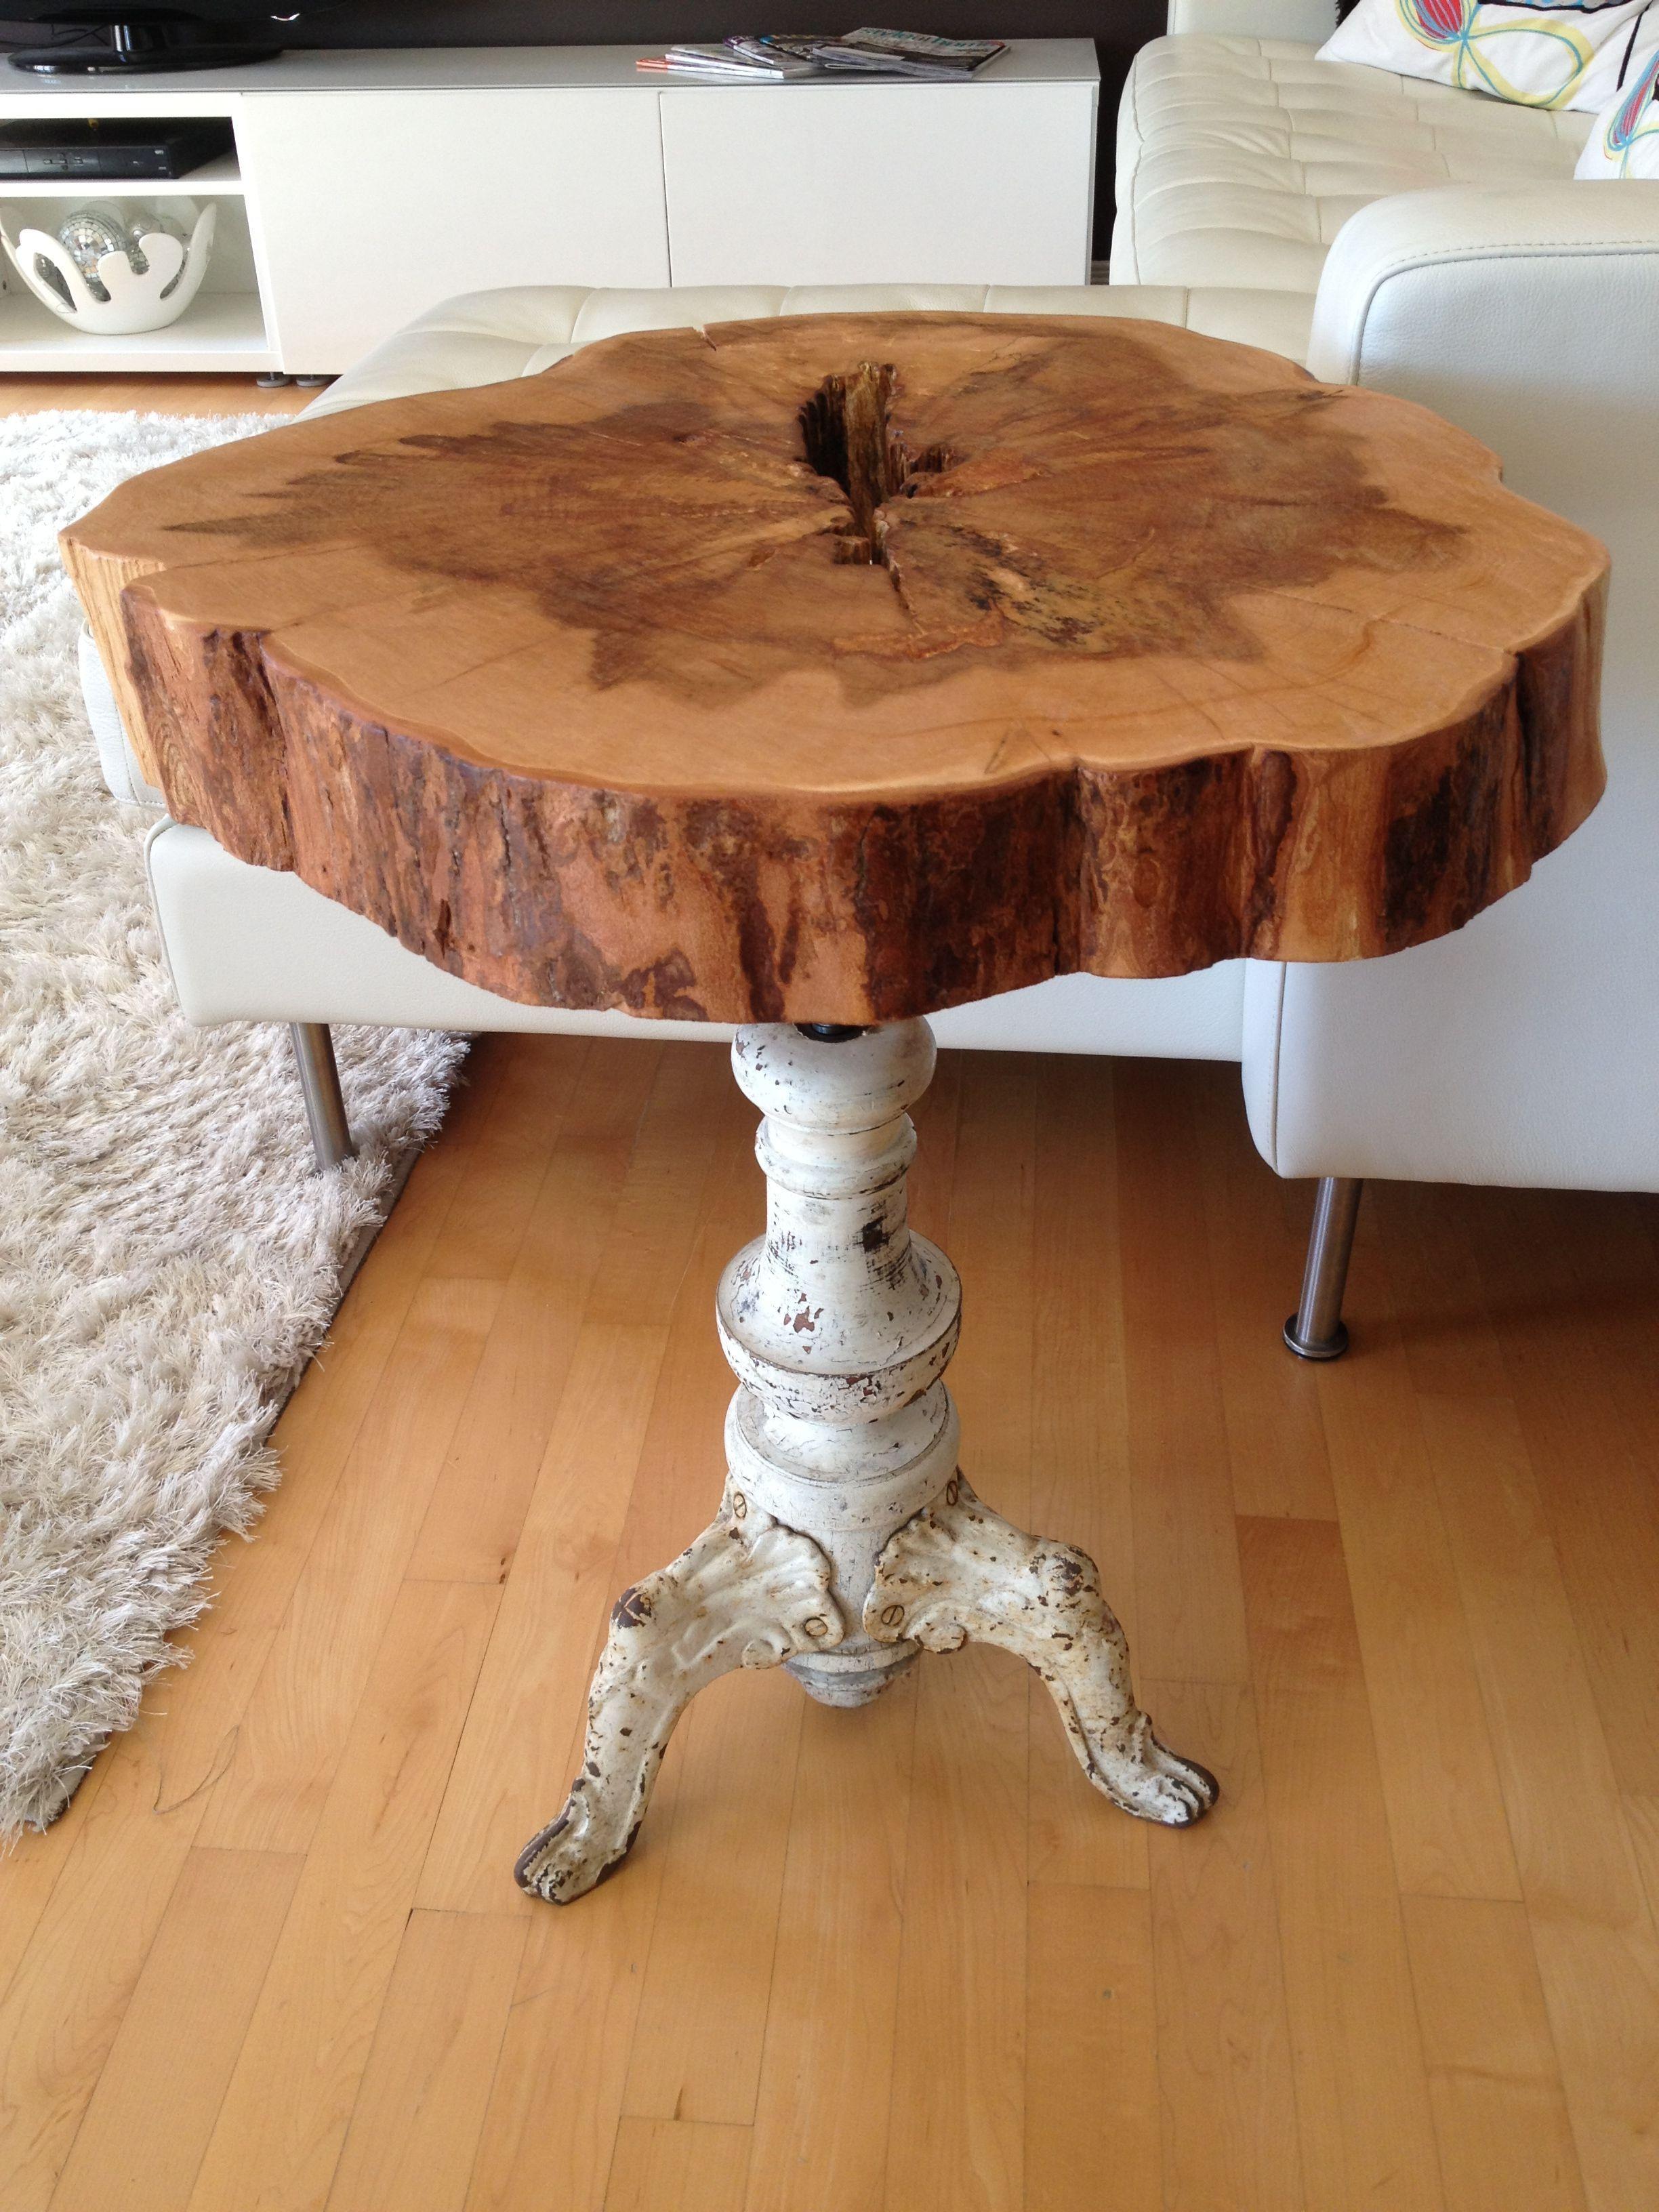 Rustic round coffee table diy tree stump table ideas u how to make them  got wood